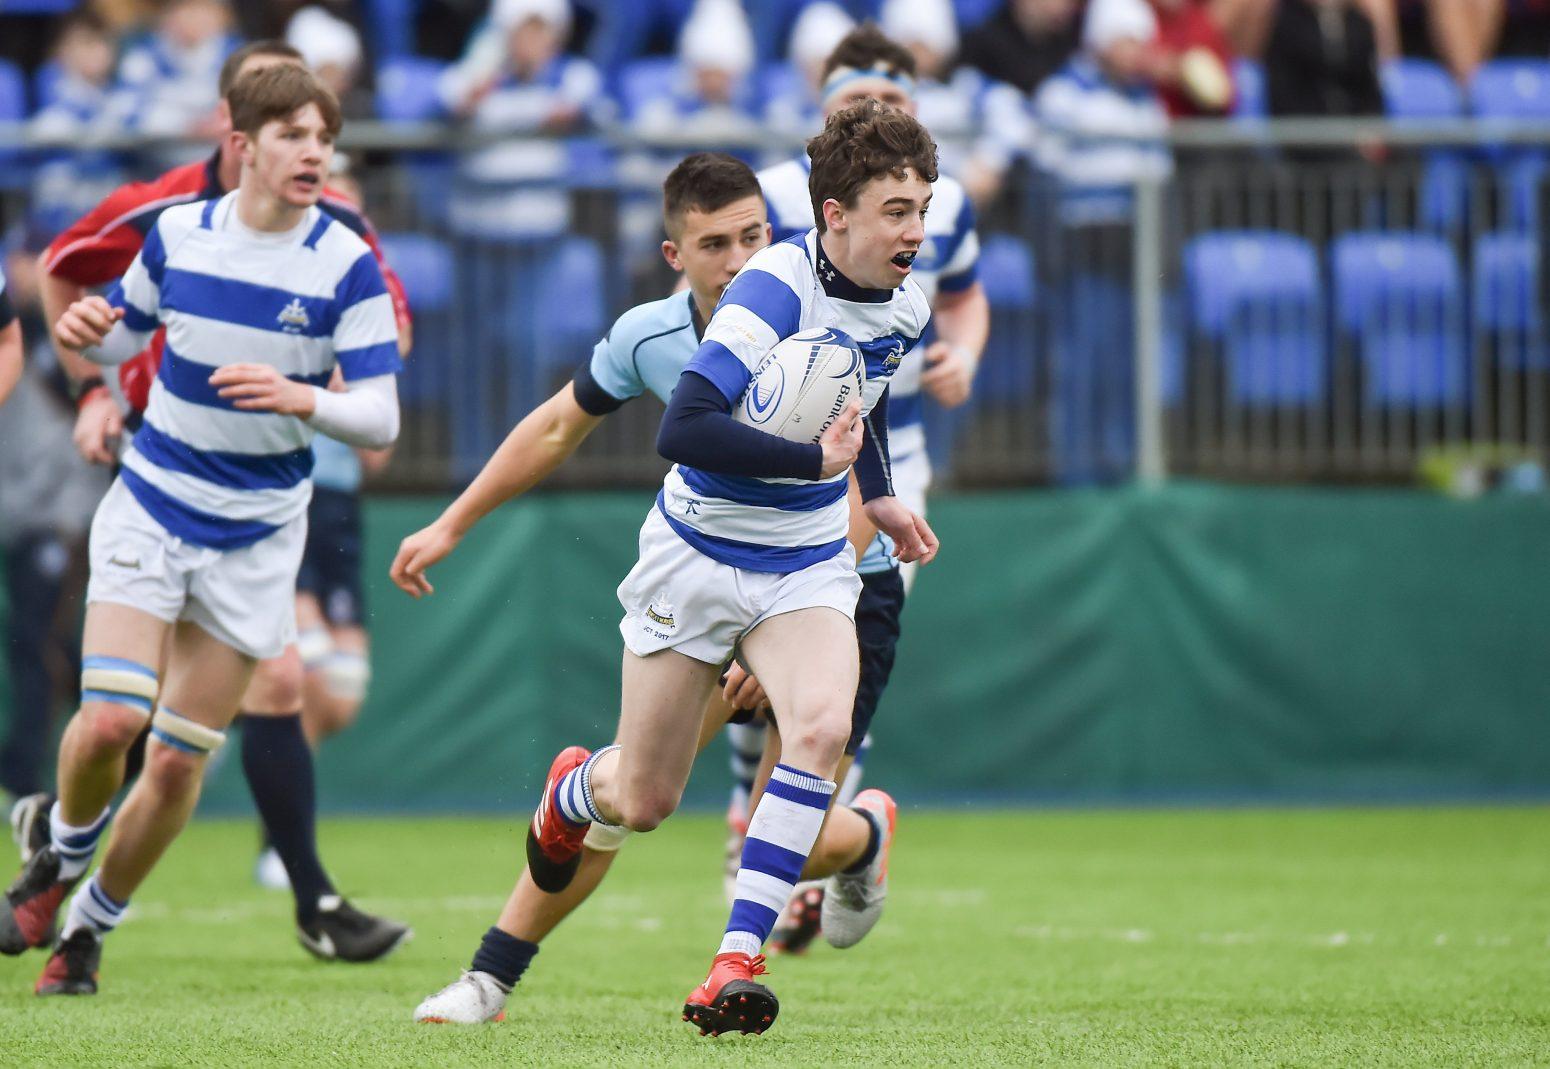 Leinster Schools Junior Cup Final